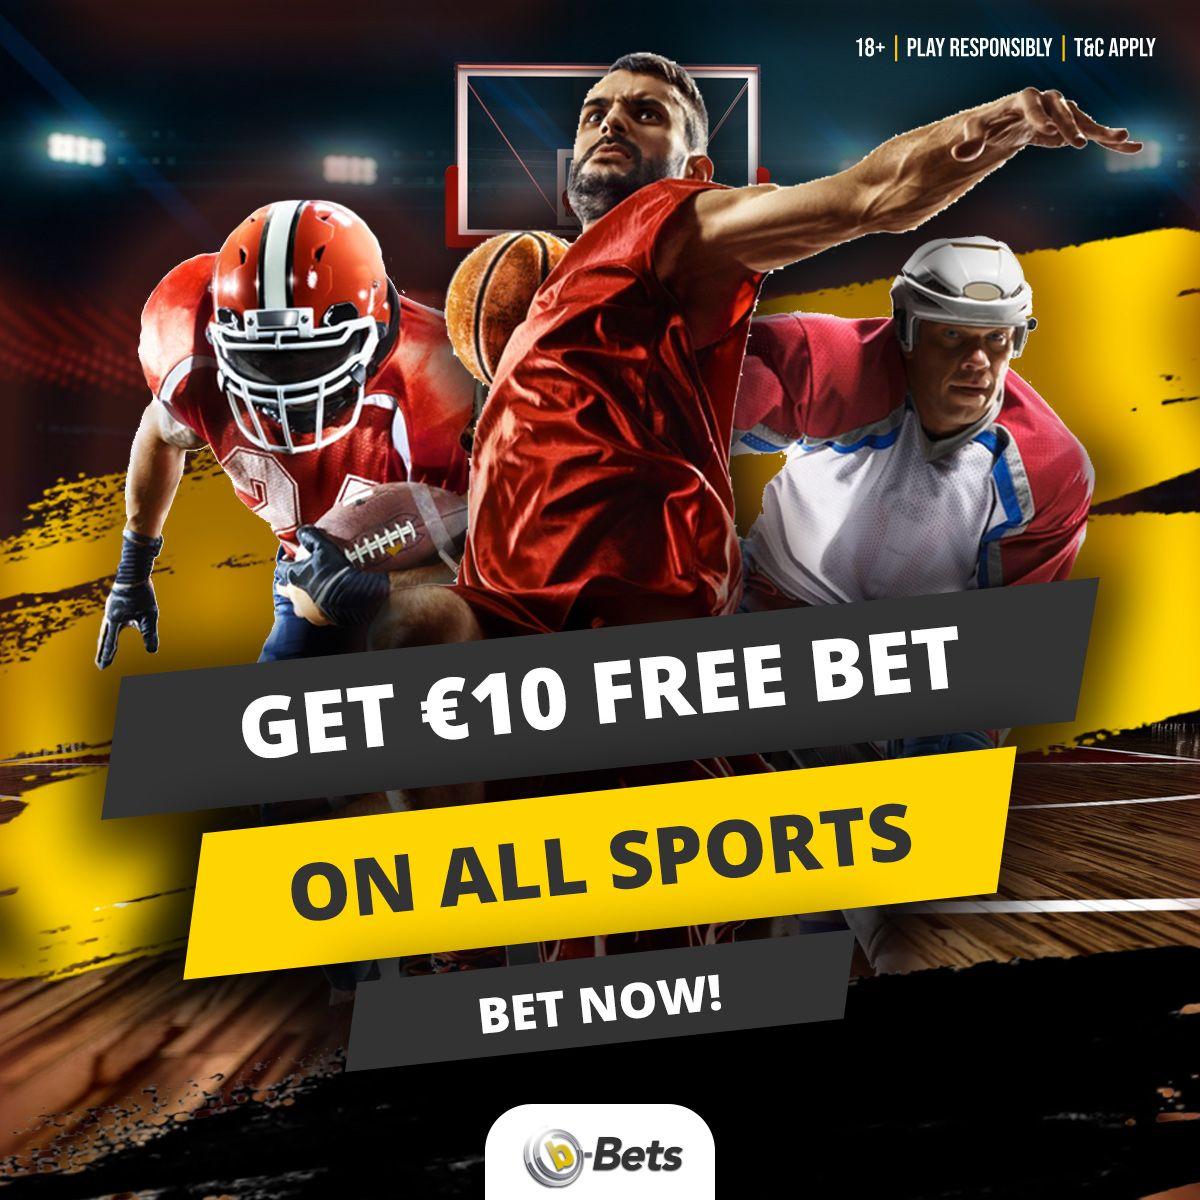 10 minimum for sports betting nfl betting odds patriots